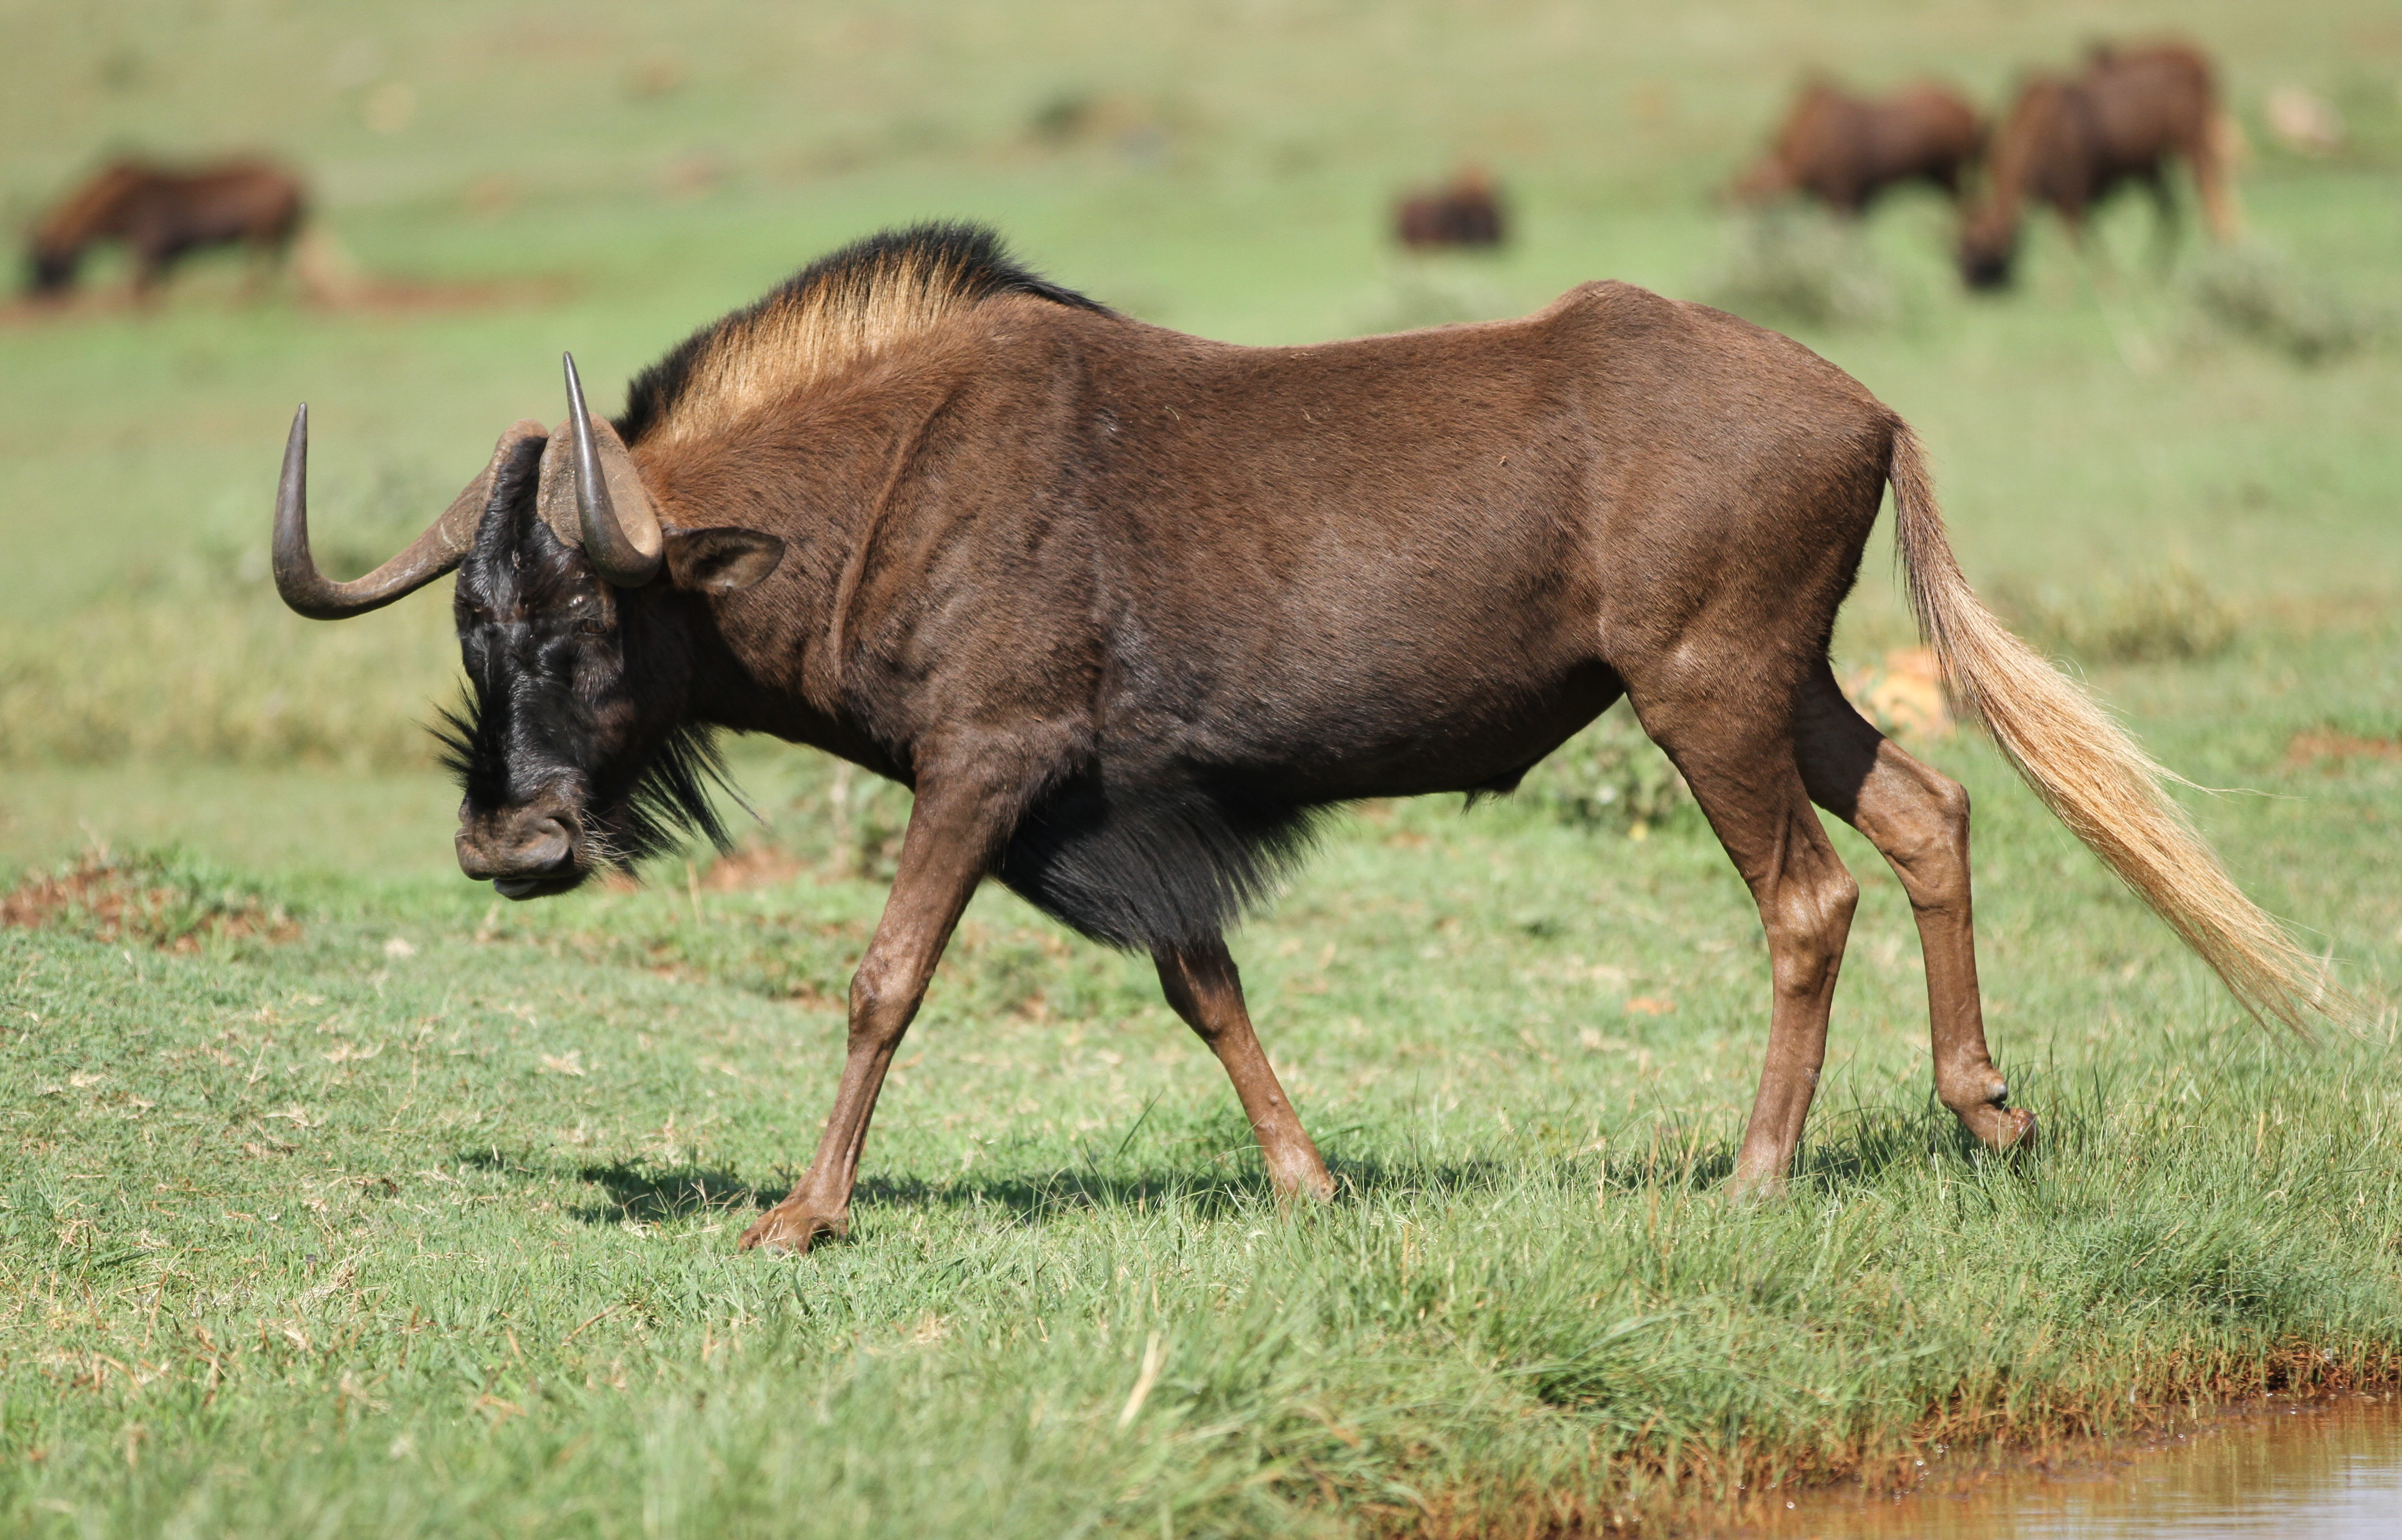 Black wildebeest, or white-tailed gnu, Connochaetes gnou at Krugersdorp Game Reserve, Gauteng, South Africa. Photo taken on November 26, 2016.